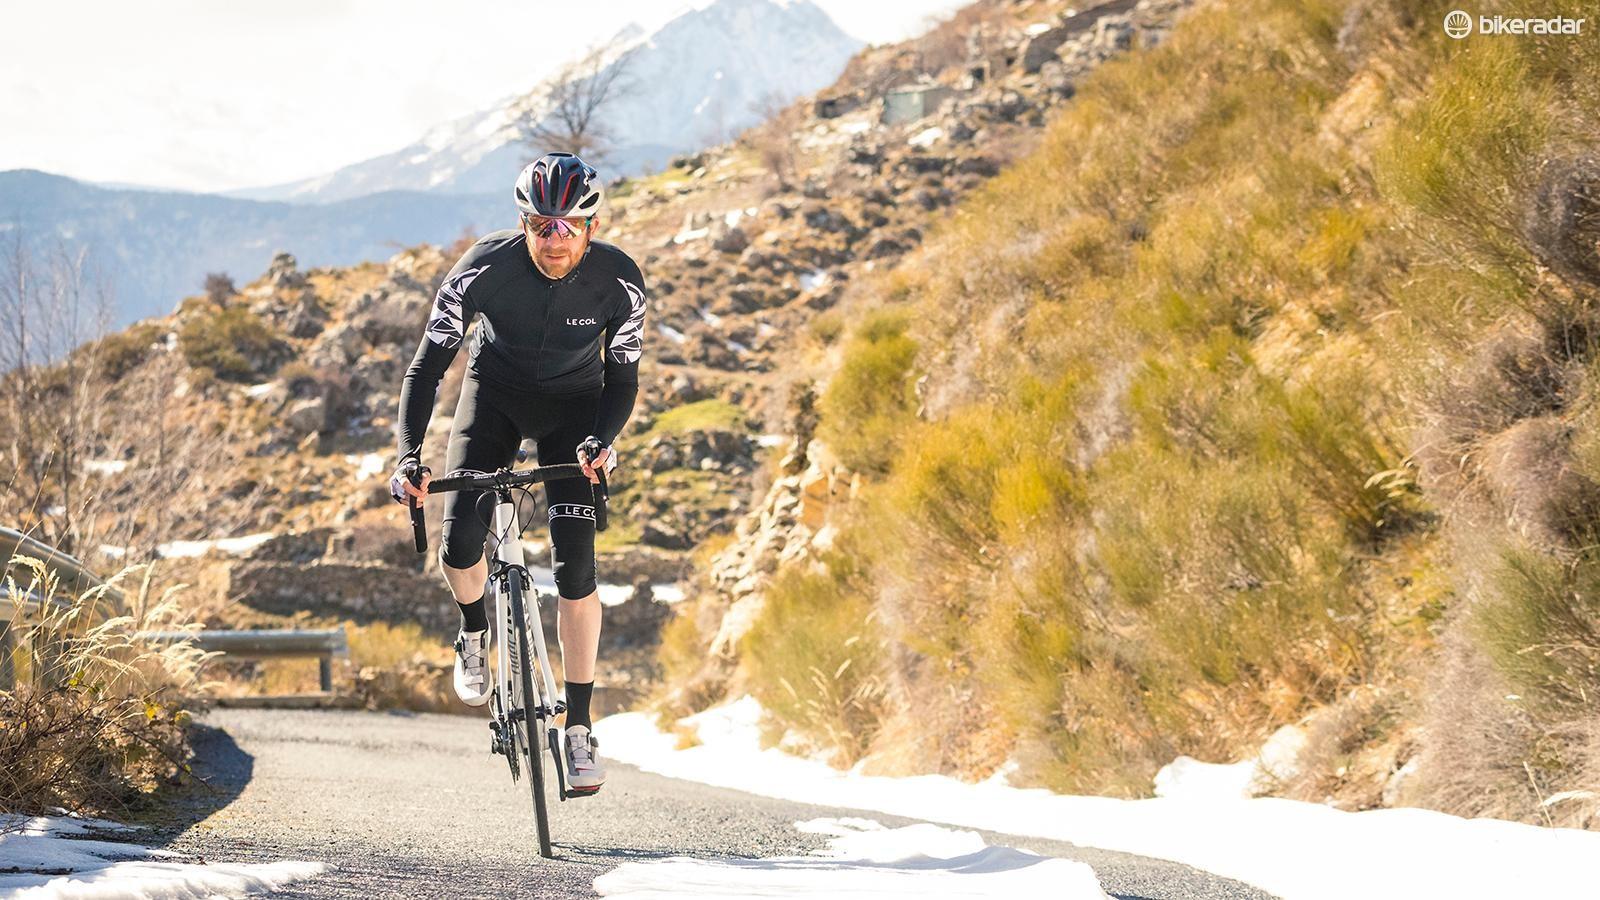 The Pro SL is a swift, sharp-handling, lightweight road bike